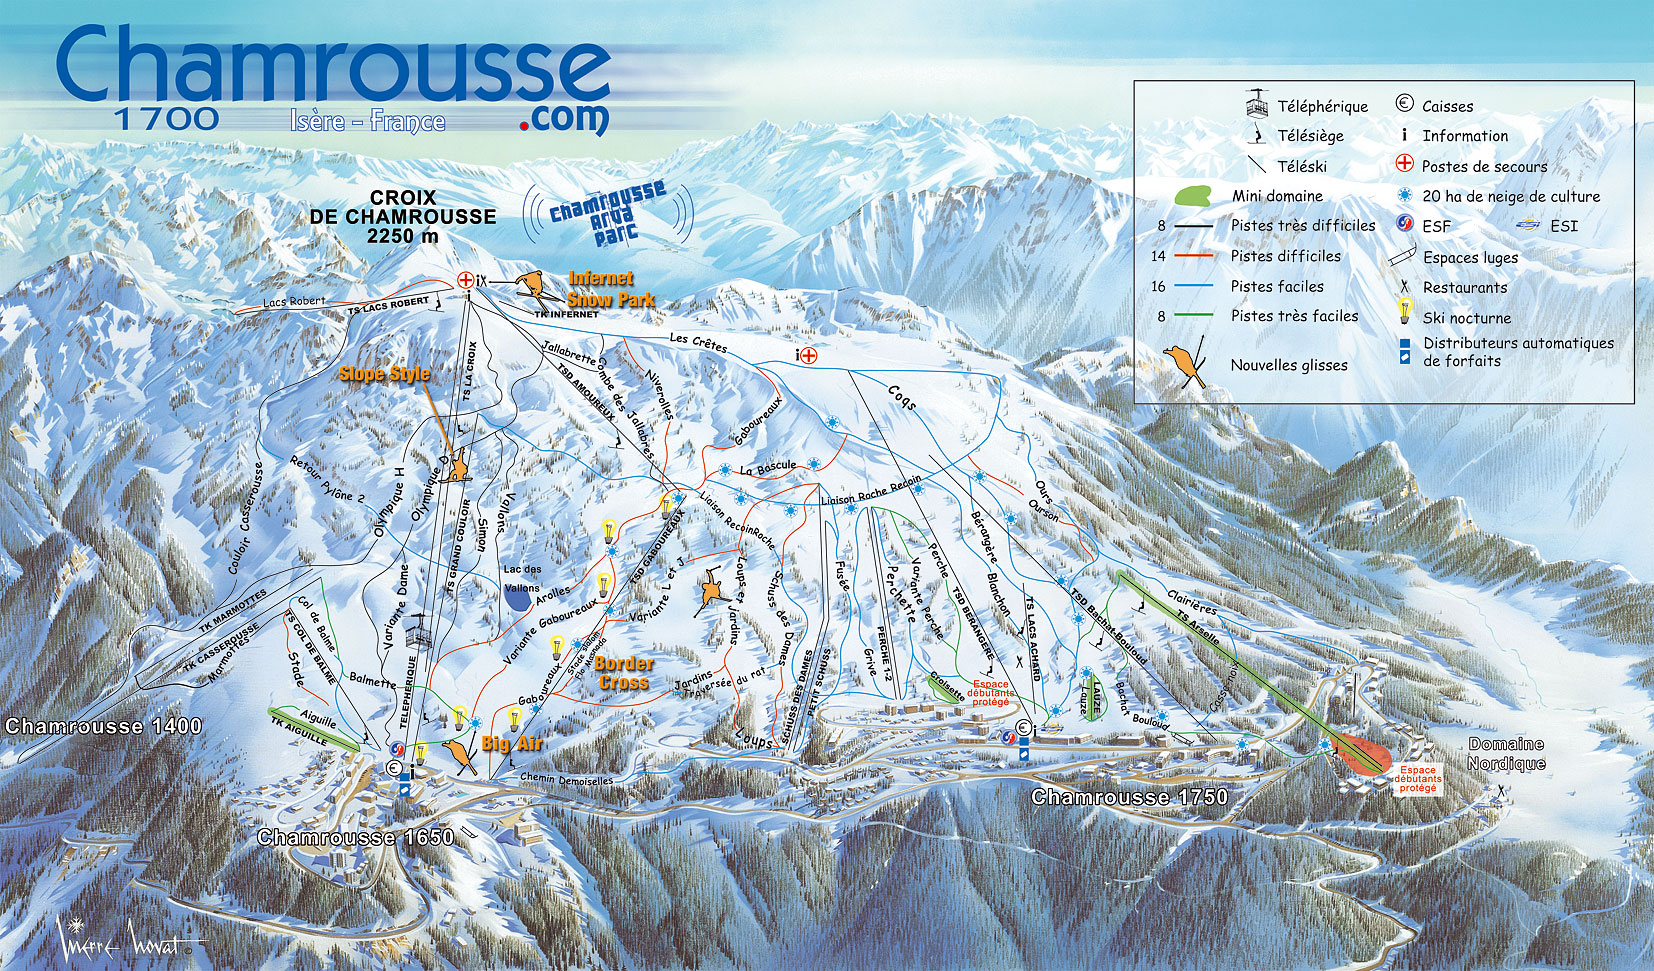 Skimap.org: Chamrousse Ski Map 2006